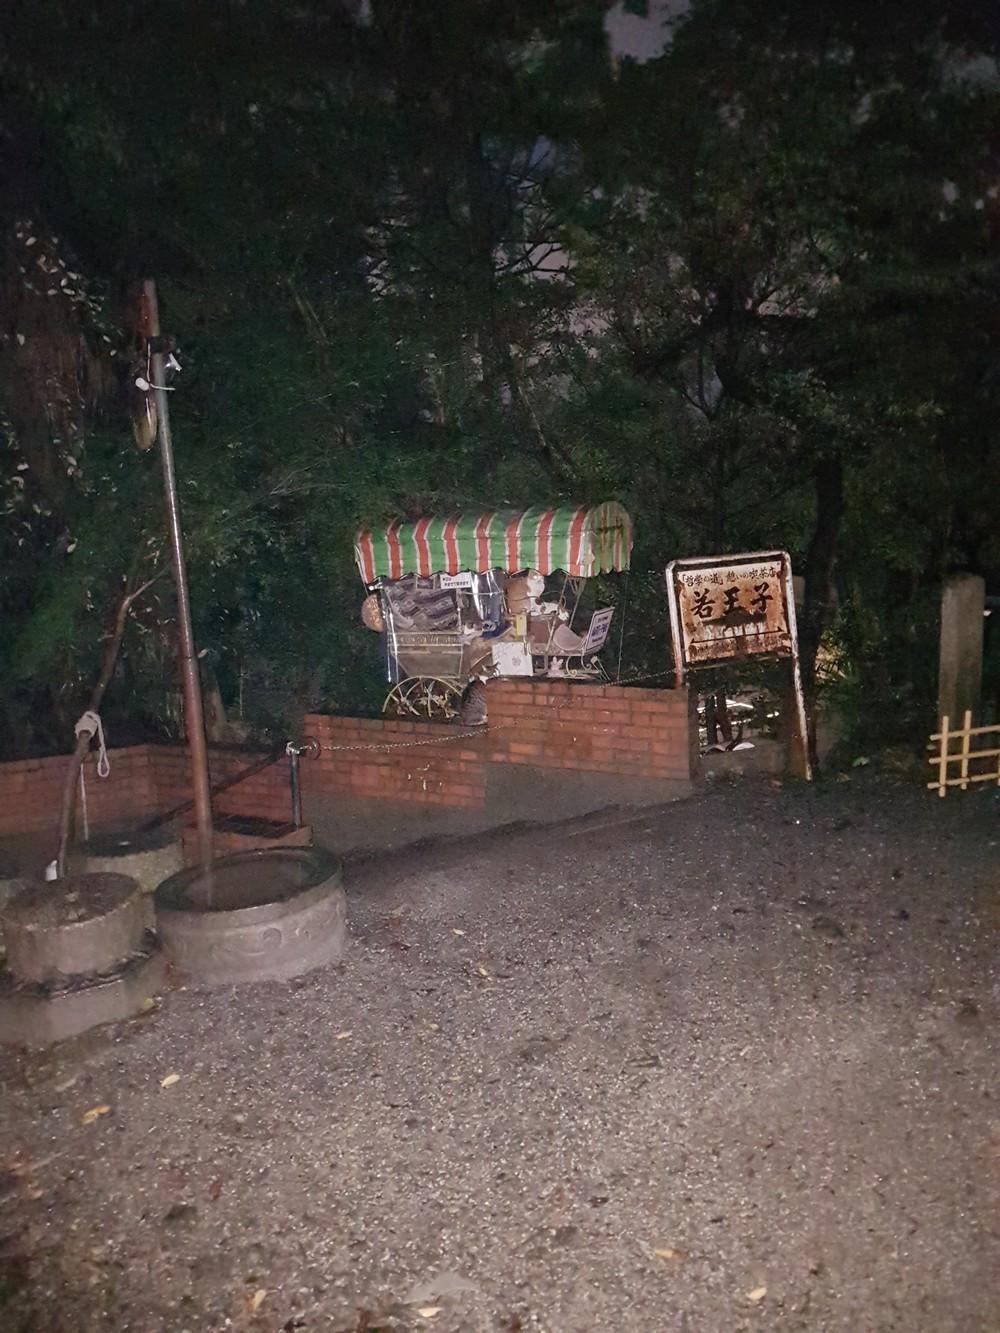 shrine_for_stray_cats_in_kyoto.jpg